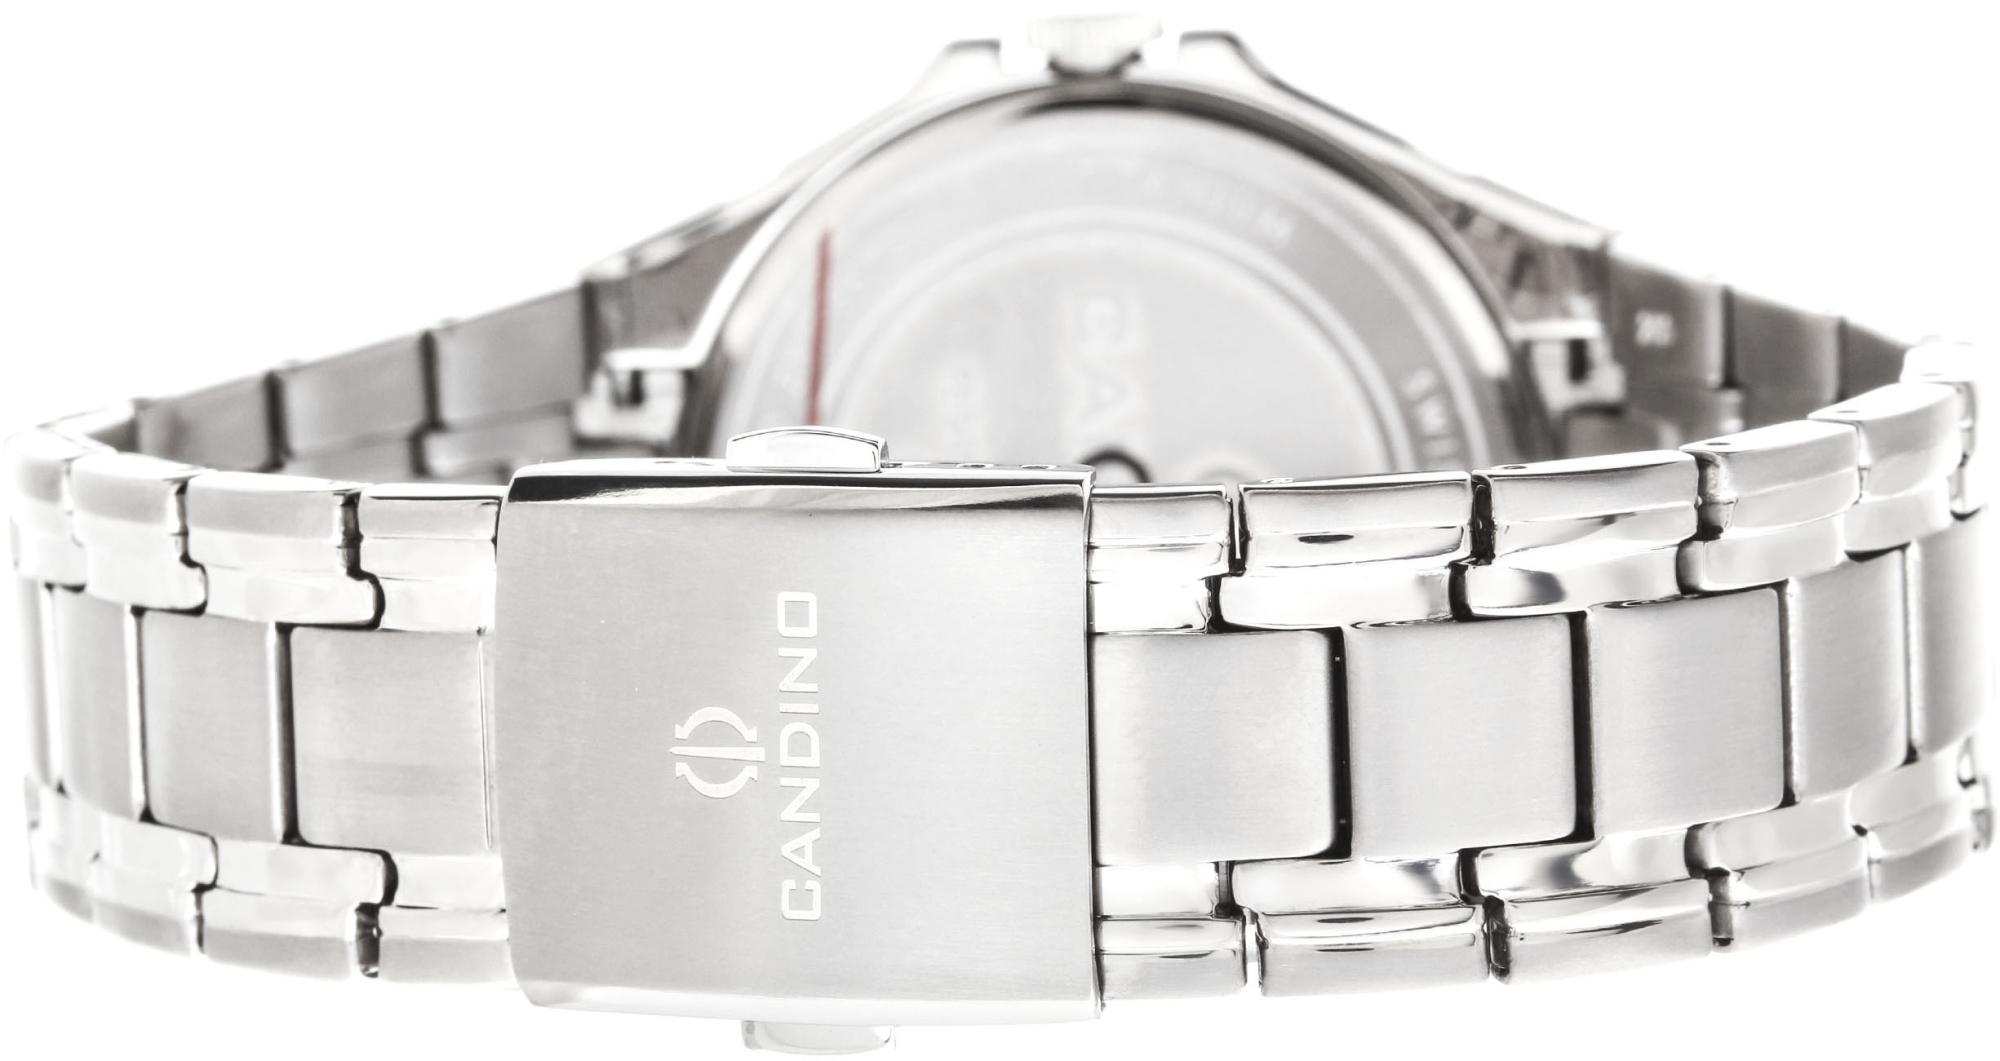 Candino Titanium C4604/4Наручные часы<br>Швейцарские часы Candino Titanium C4604/4<br><br>Пол: Мужские<br>Страна-производитель: Швейцария<br>Механизм: Кварцевый<br>Материал корпуса: Титан<br>Материал ремня/браслета: Титан<br>Водозащита, диапазон: None<br>Стекло: Сапфировое<br>Толщина корпуса: None<br>Стиль: None